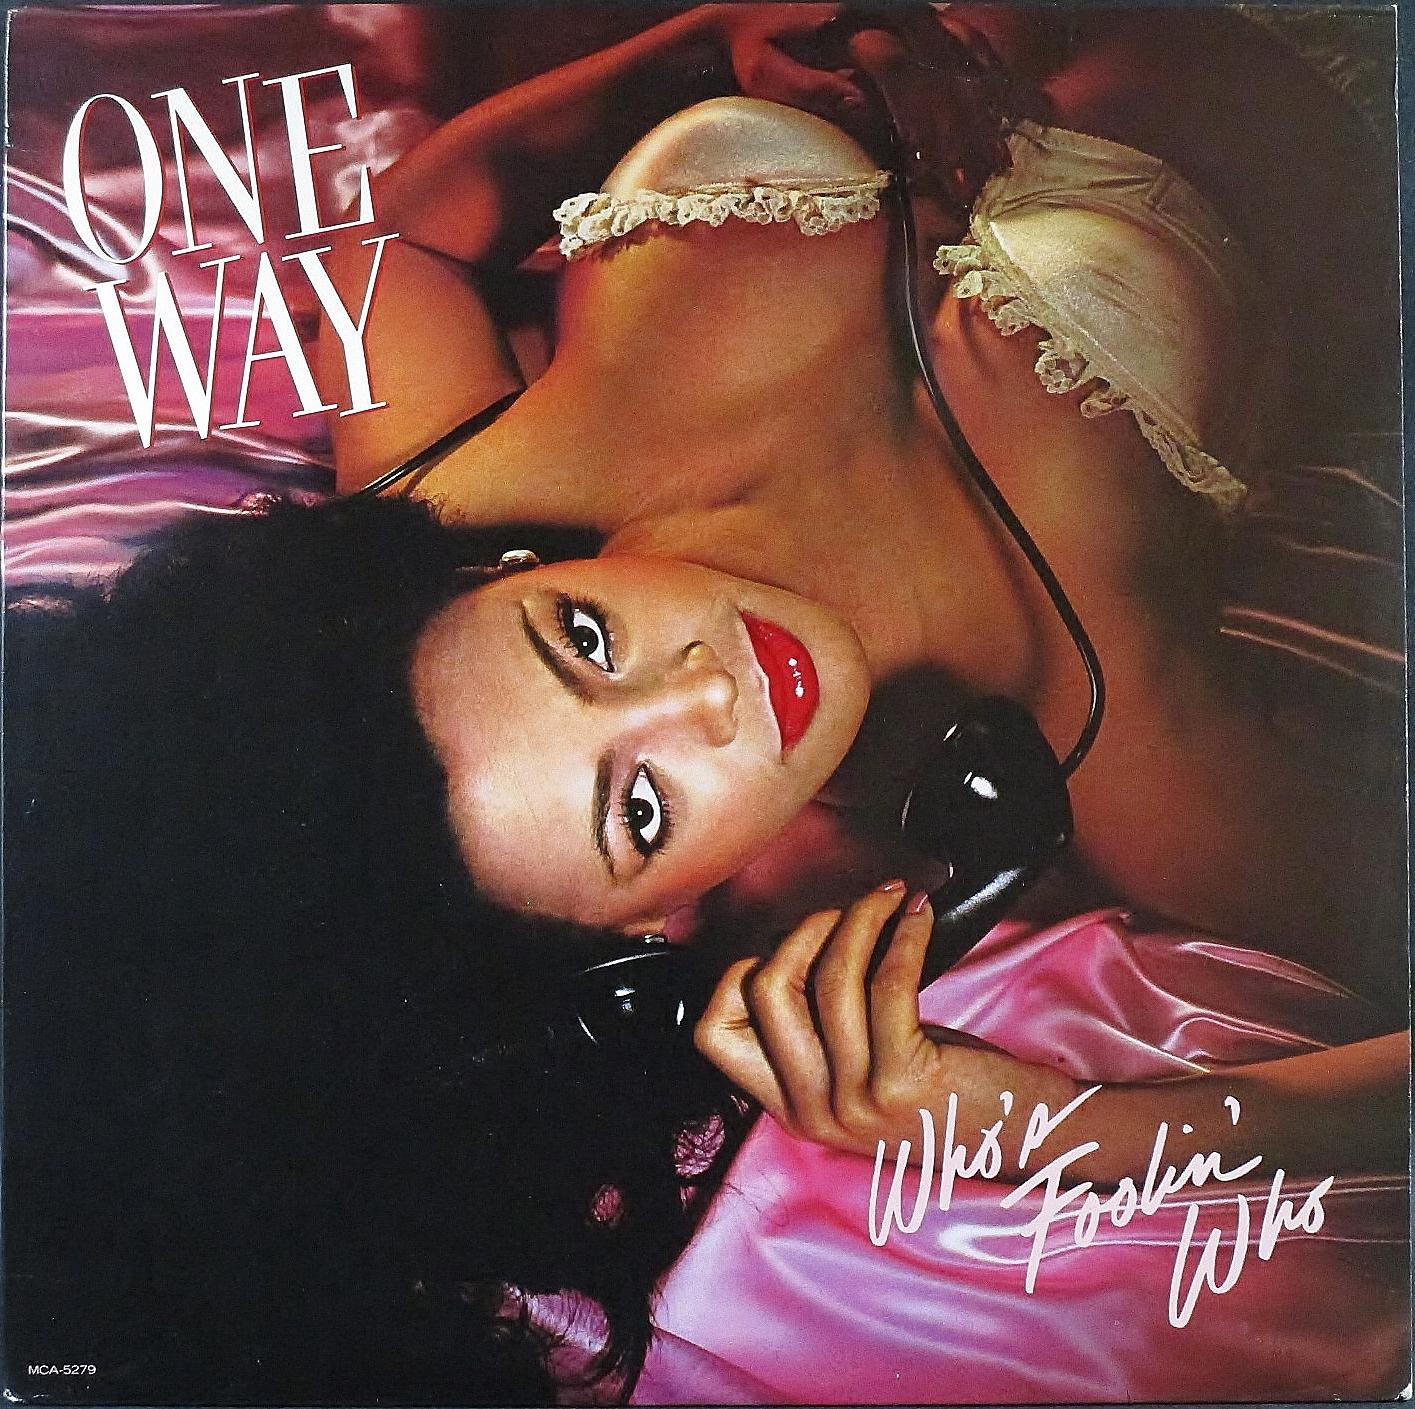 One Way ワン・ウェイ / Who's Foolin' Who